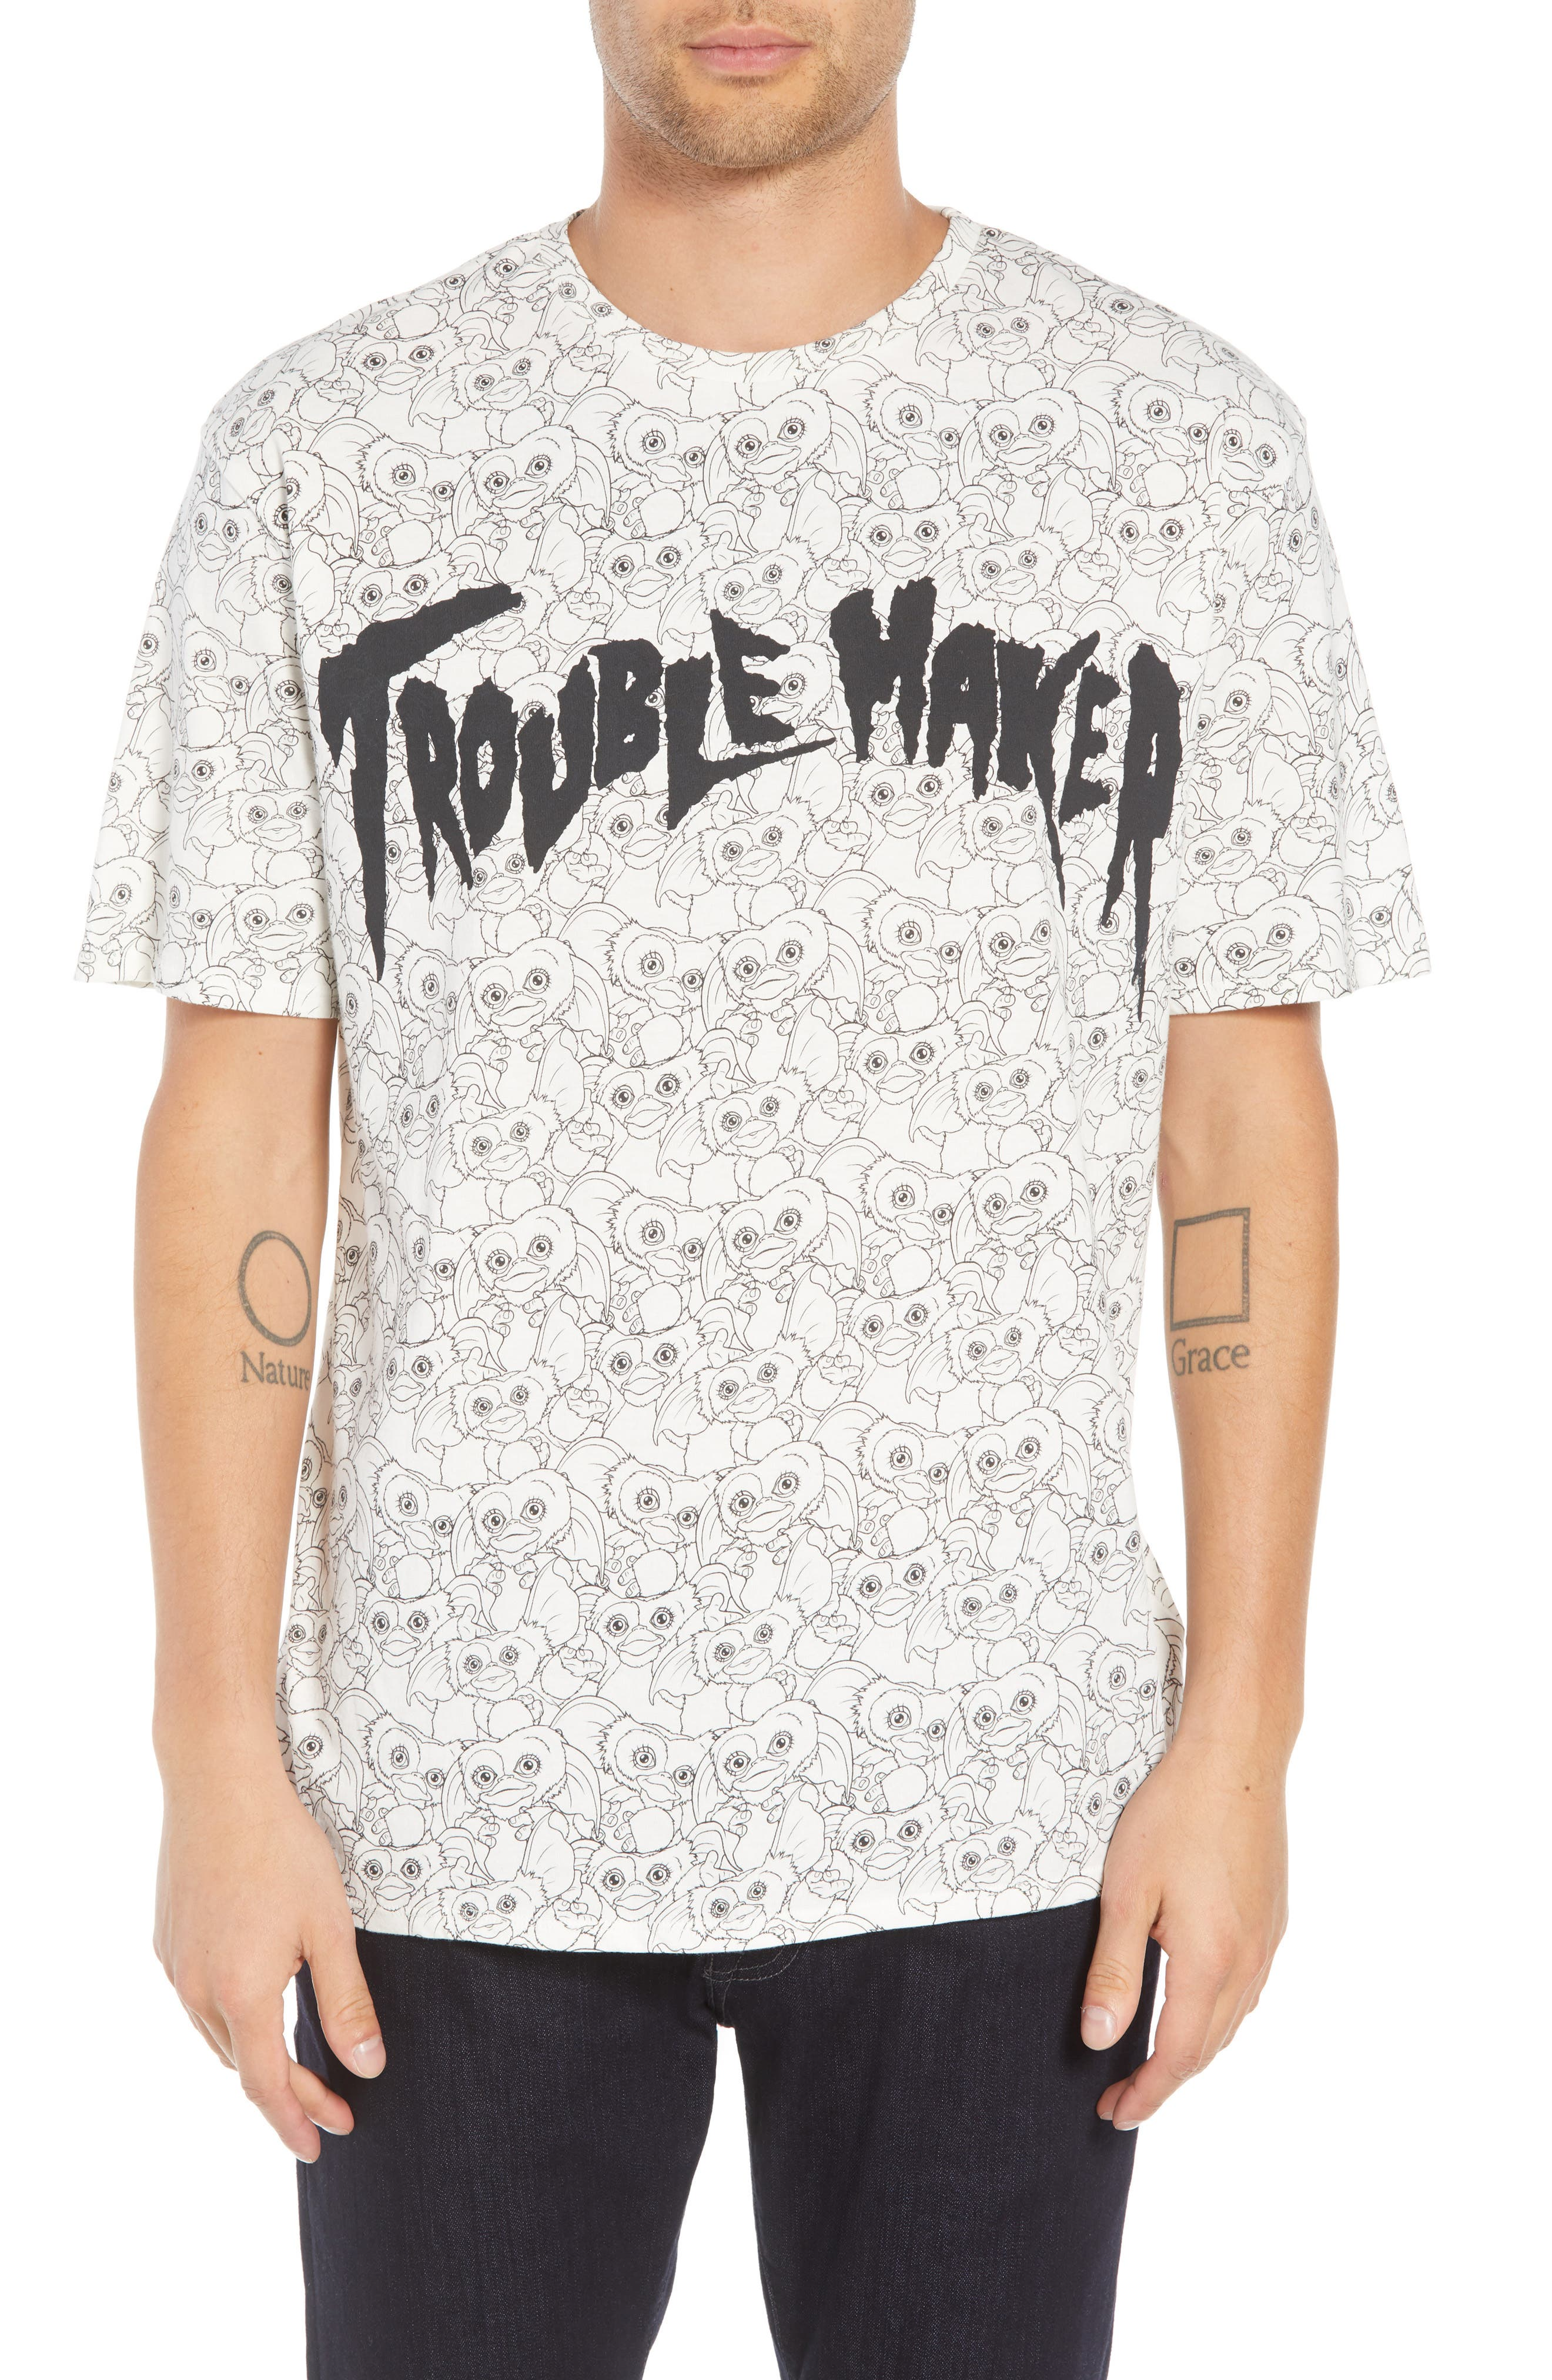 ELEVENPARIS Trouble Maker Graphic T-Shirt in White